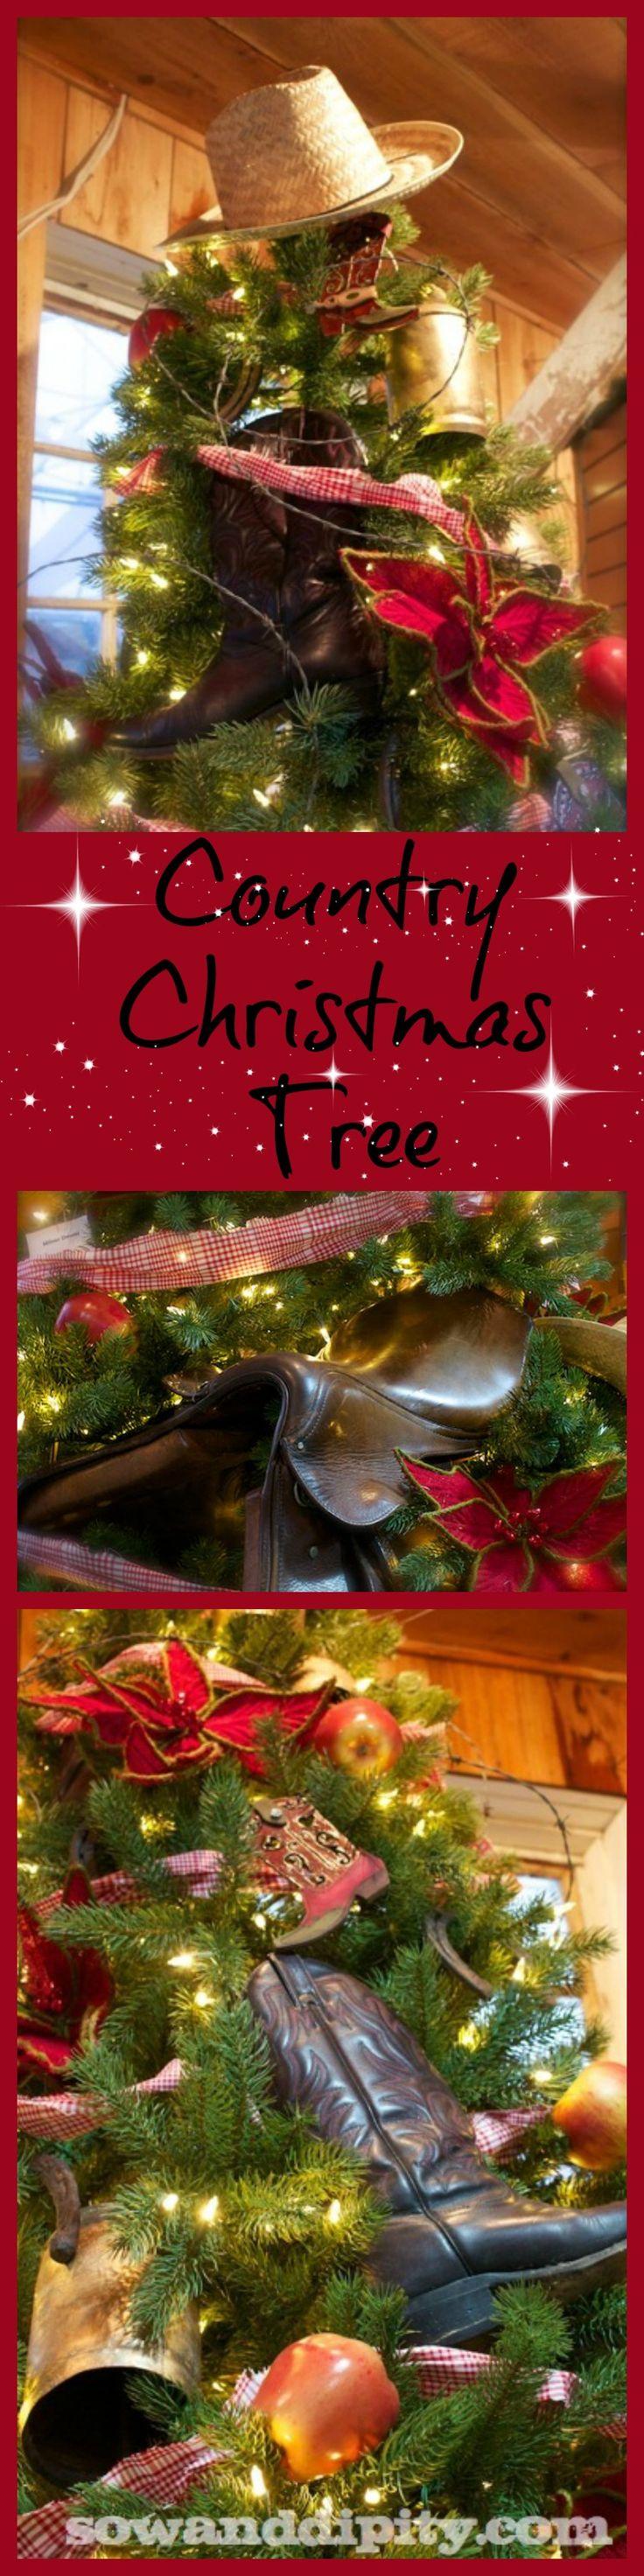 Country Christmas Tree #christmastree